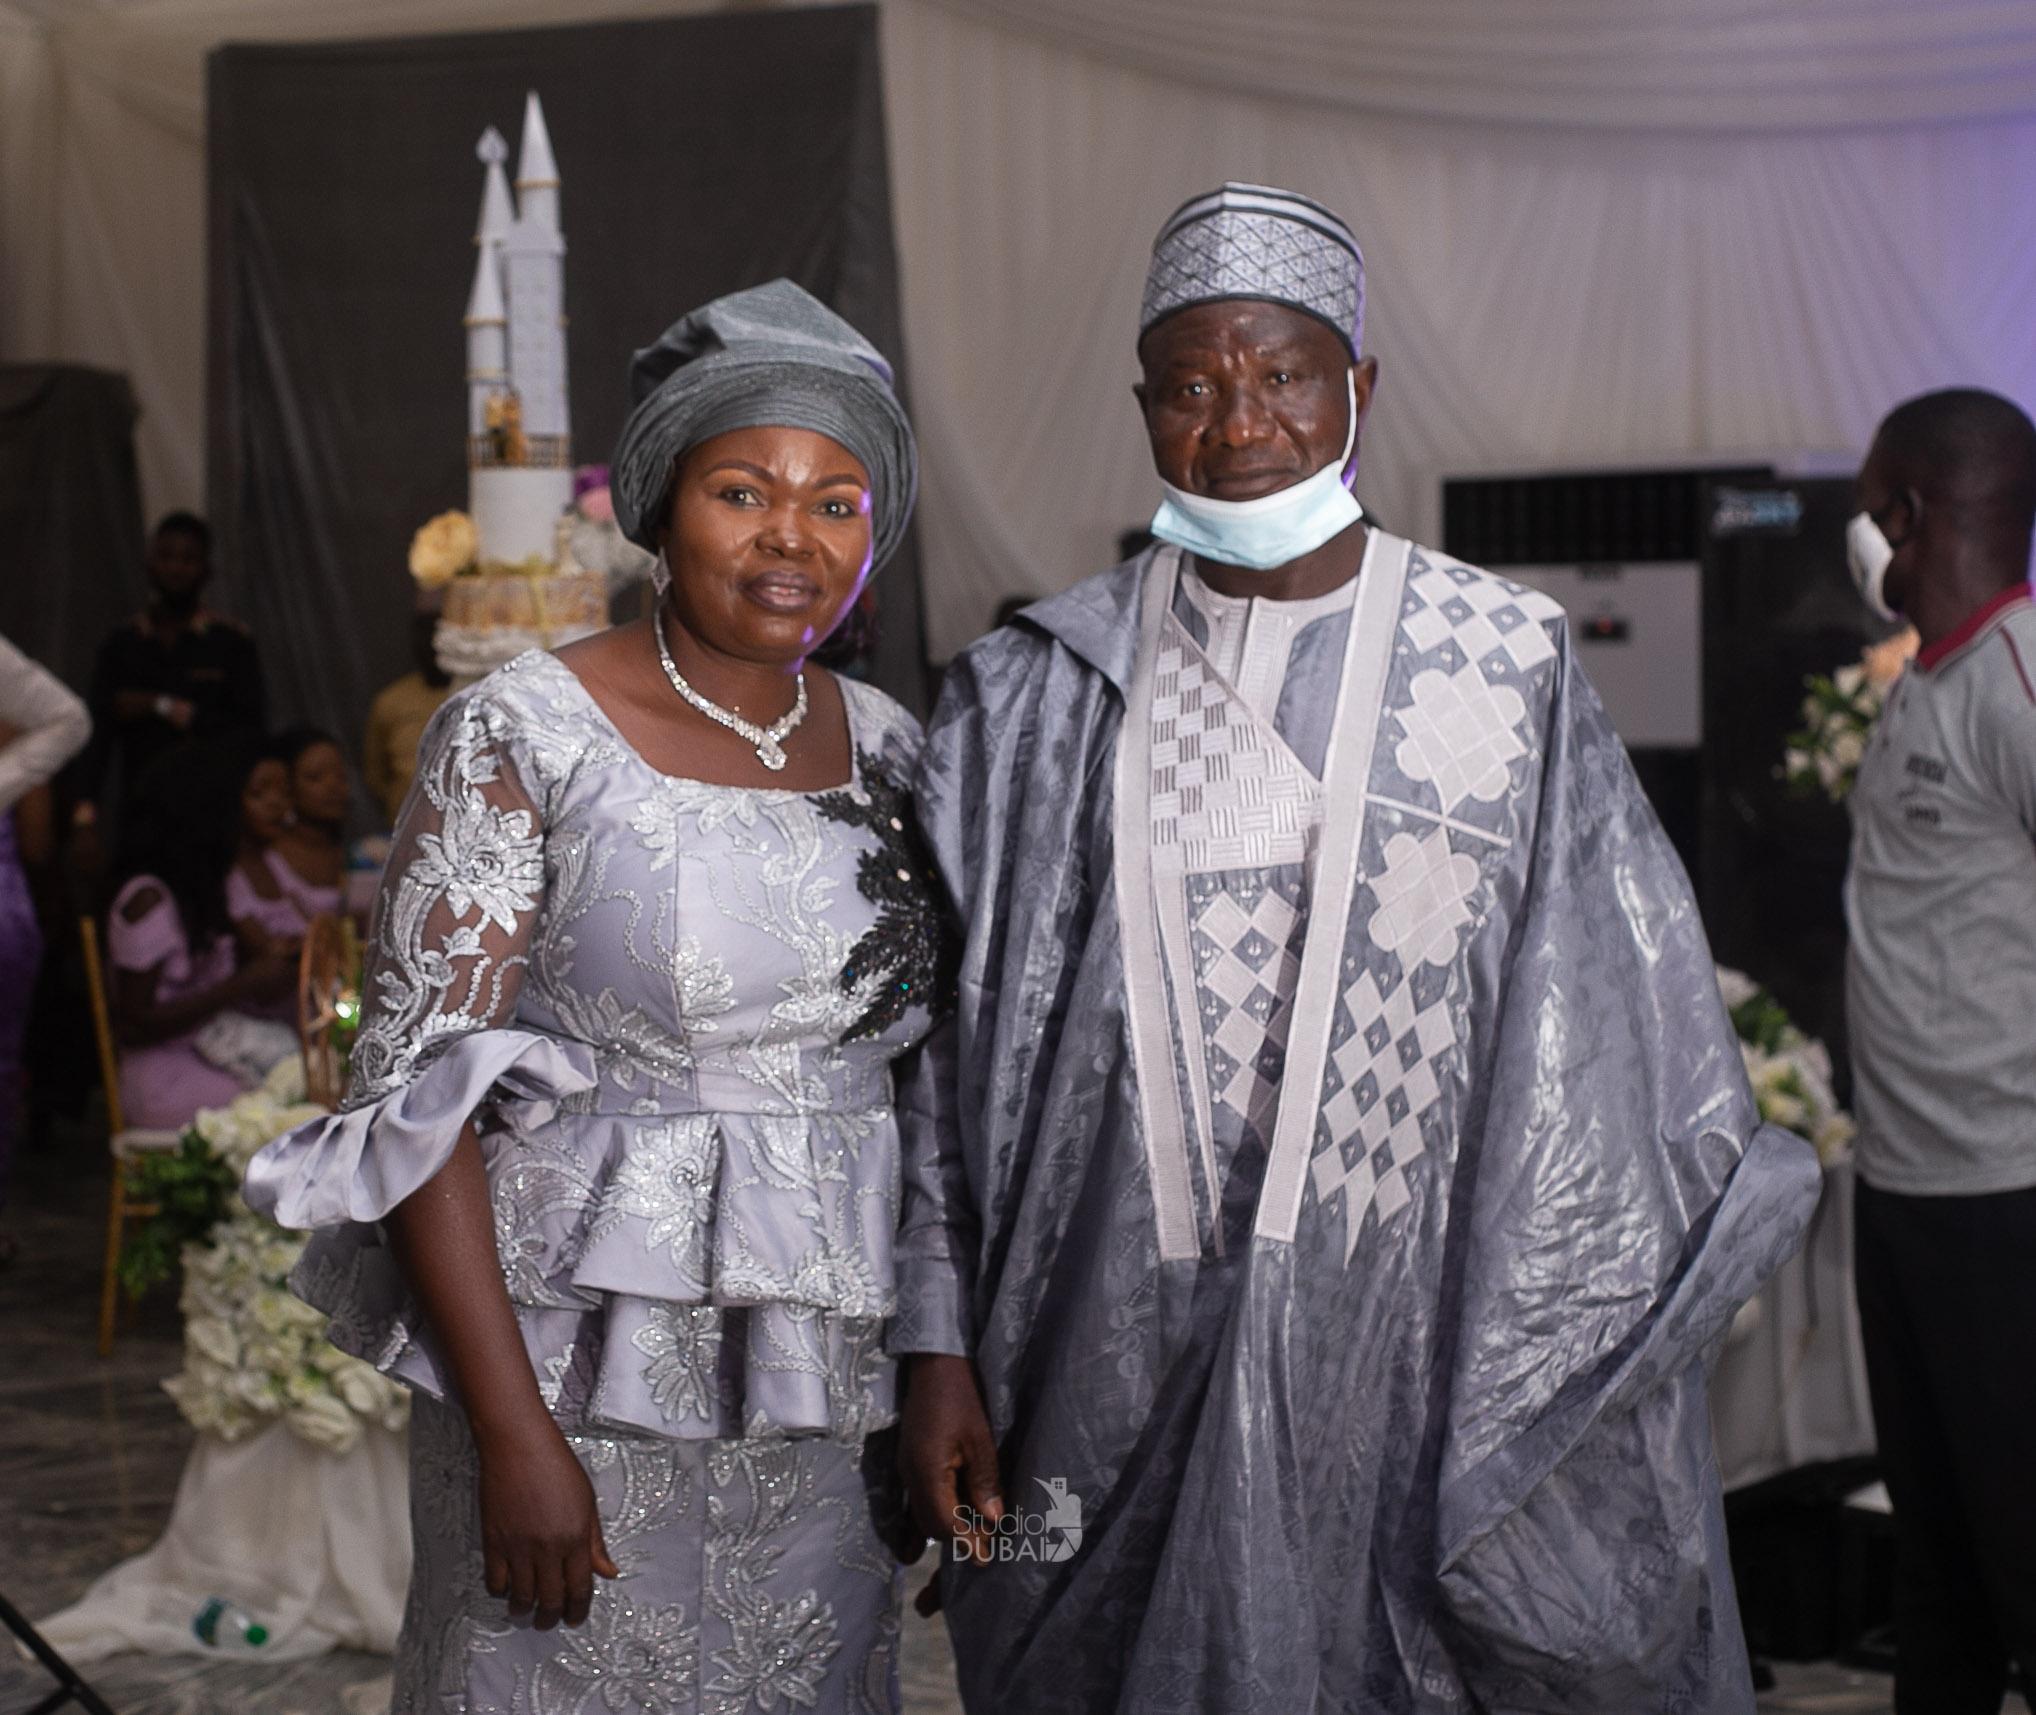 Former Gov. Mu'azu, Prof. Bogoro, BAHA Speaker and others attends Morumda's Wedding at Bauchi